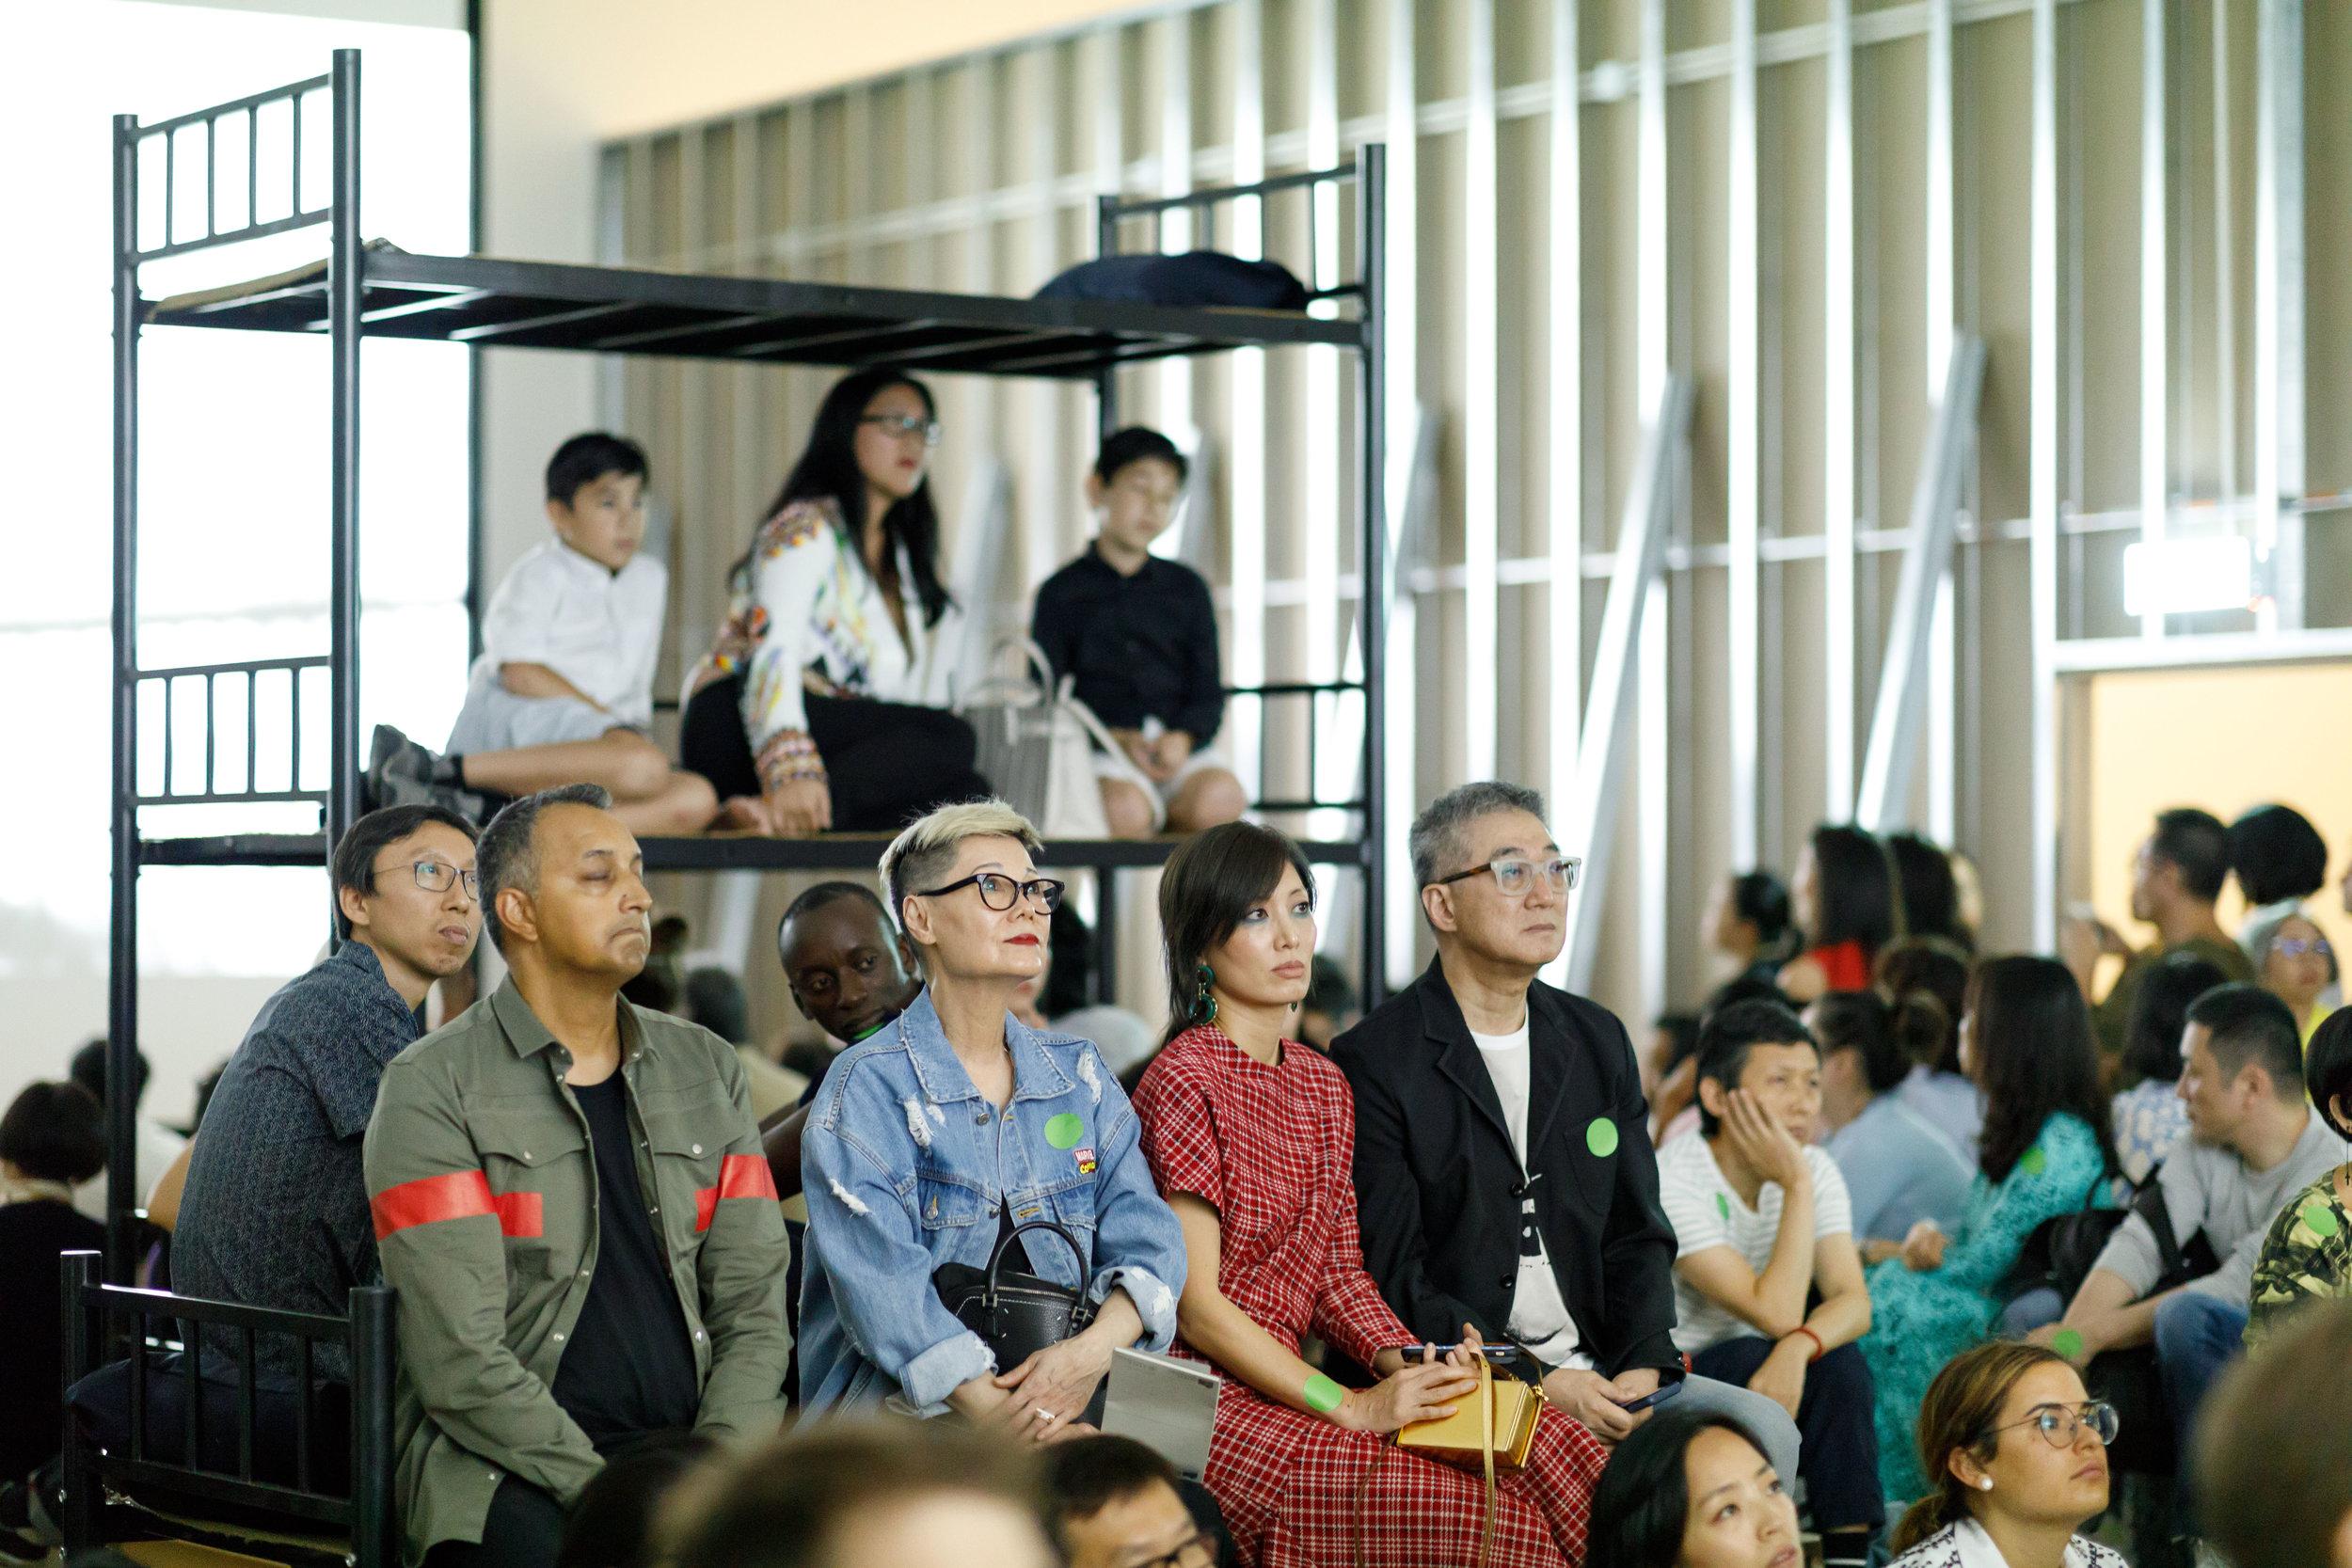 Can Fei Tai Kwun Contemporary Exhibition (A HOLLOW IN A WORLD TOO FULL). Hong Kong. 2018